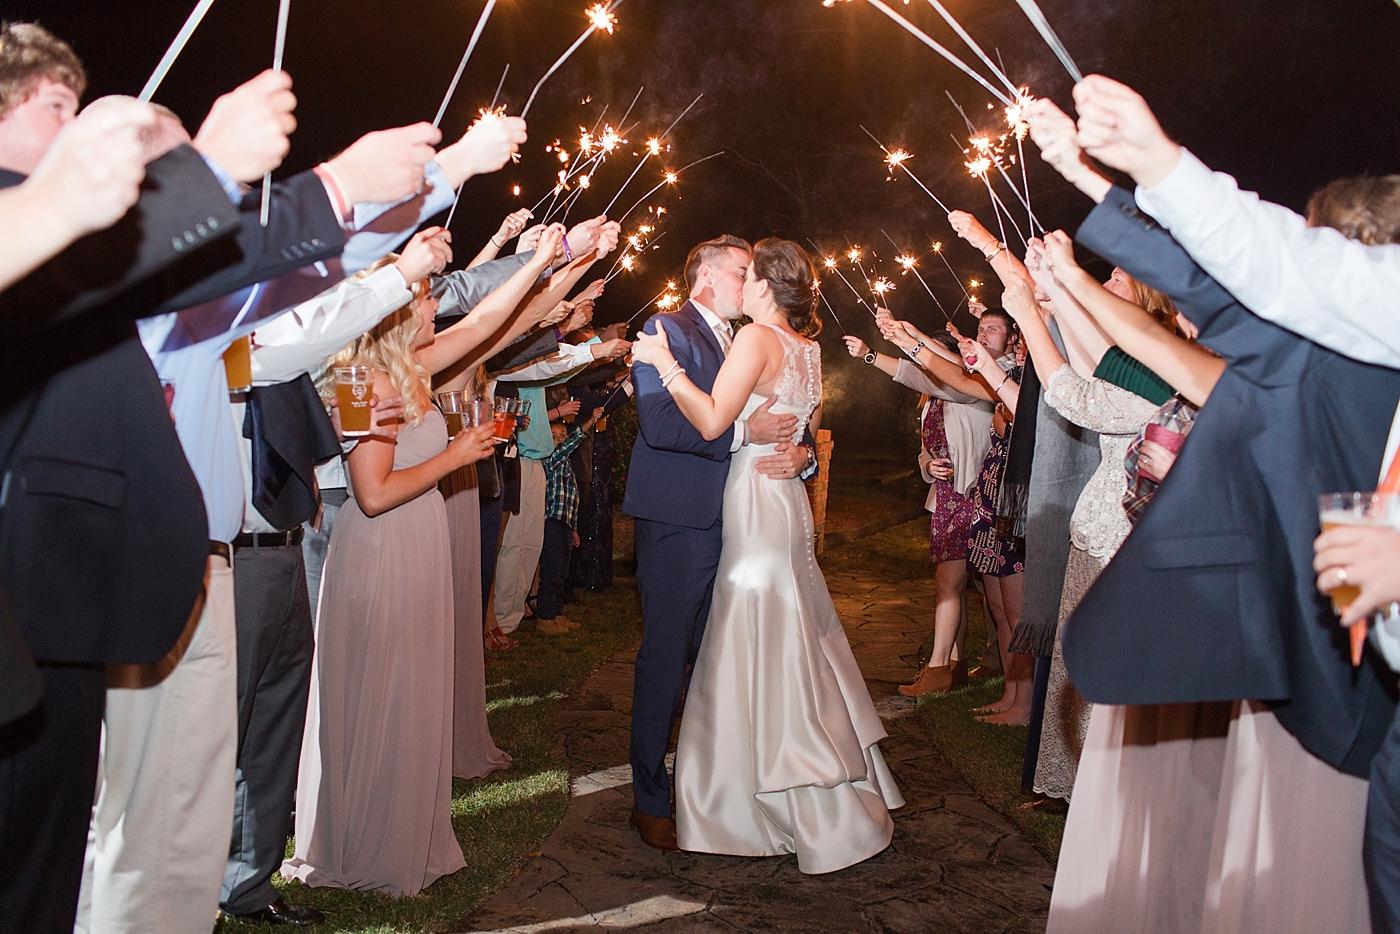 greenville-nc-wedding-the-robins-nest_83.jpg